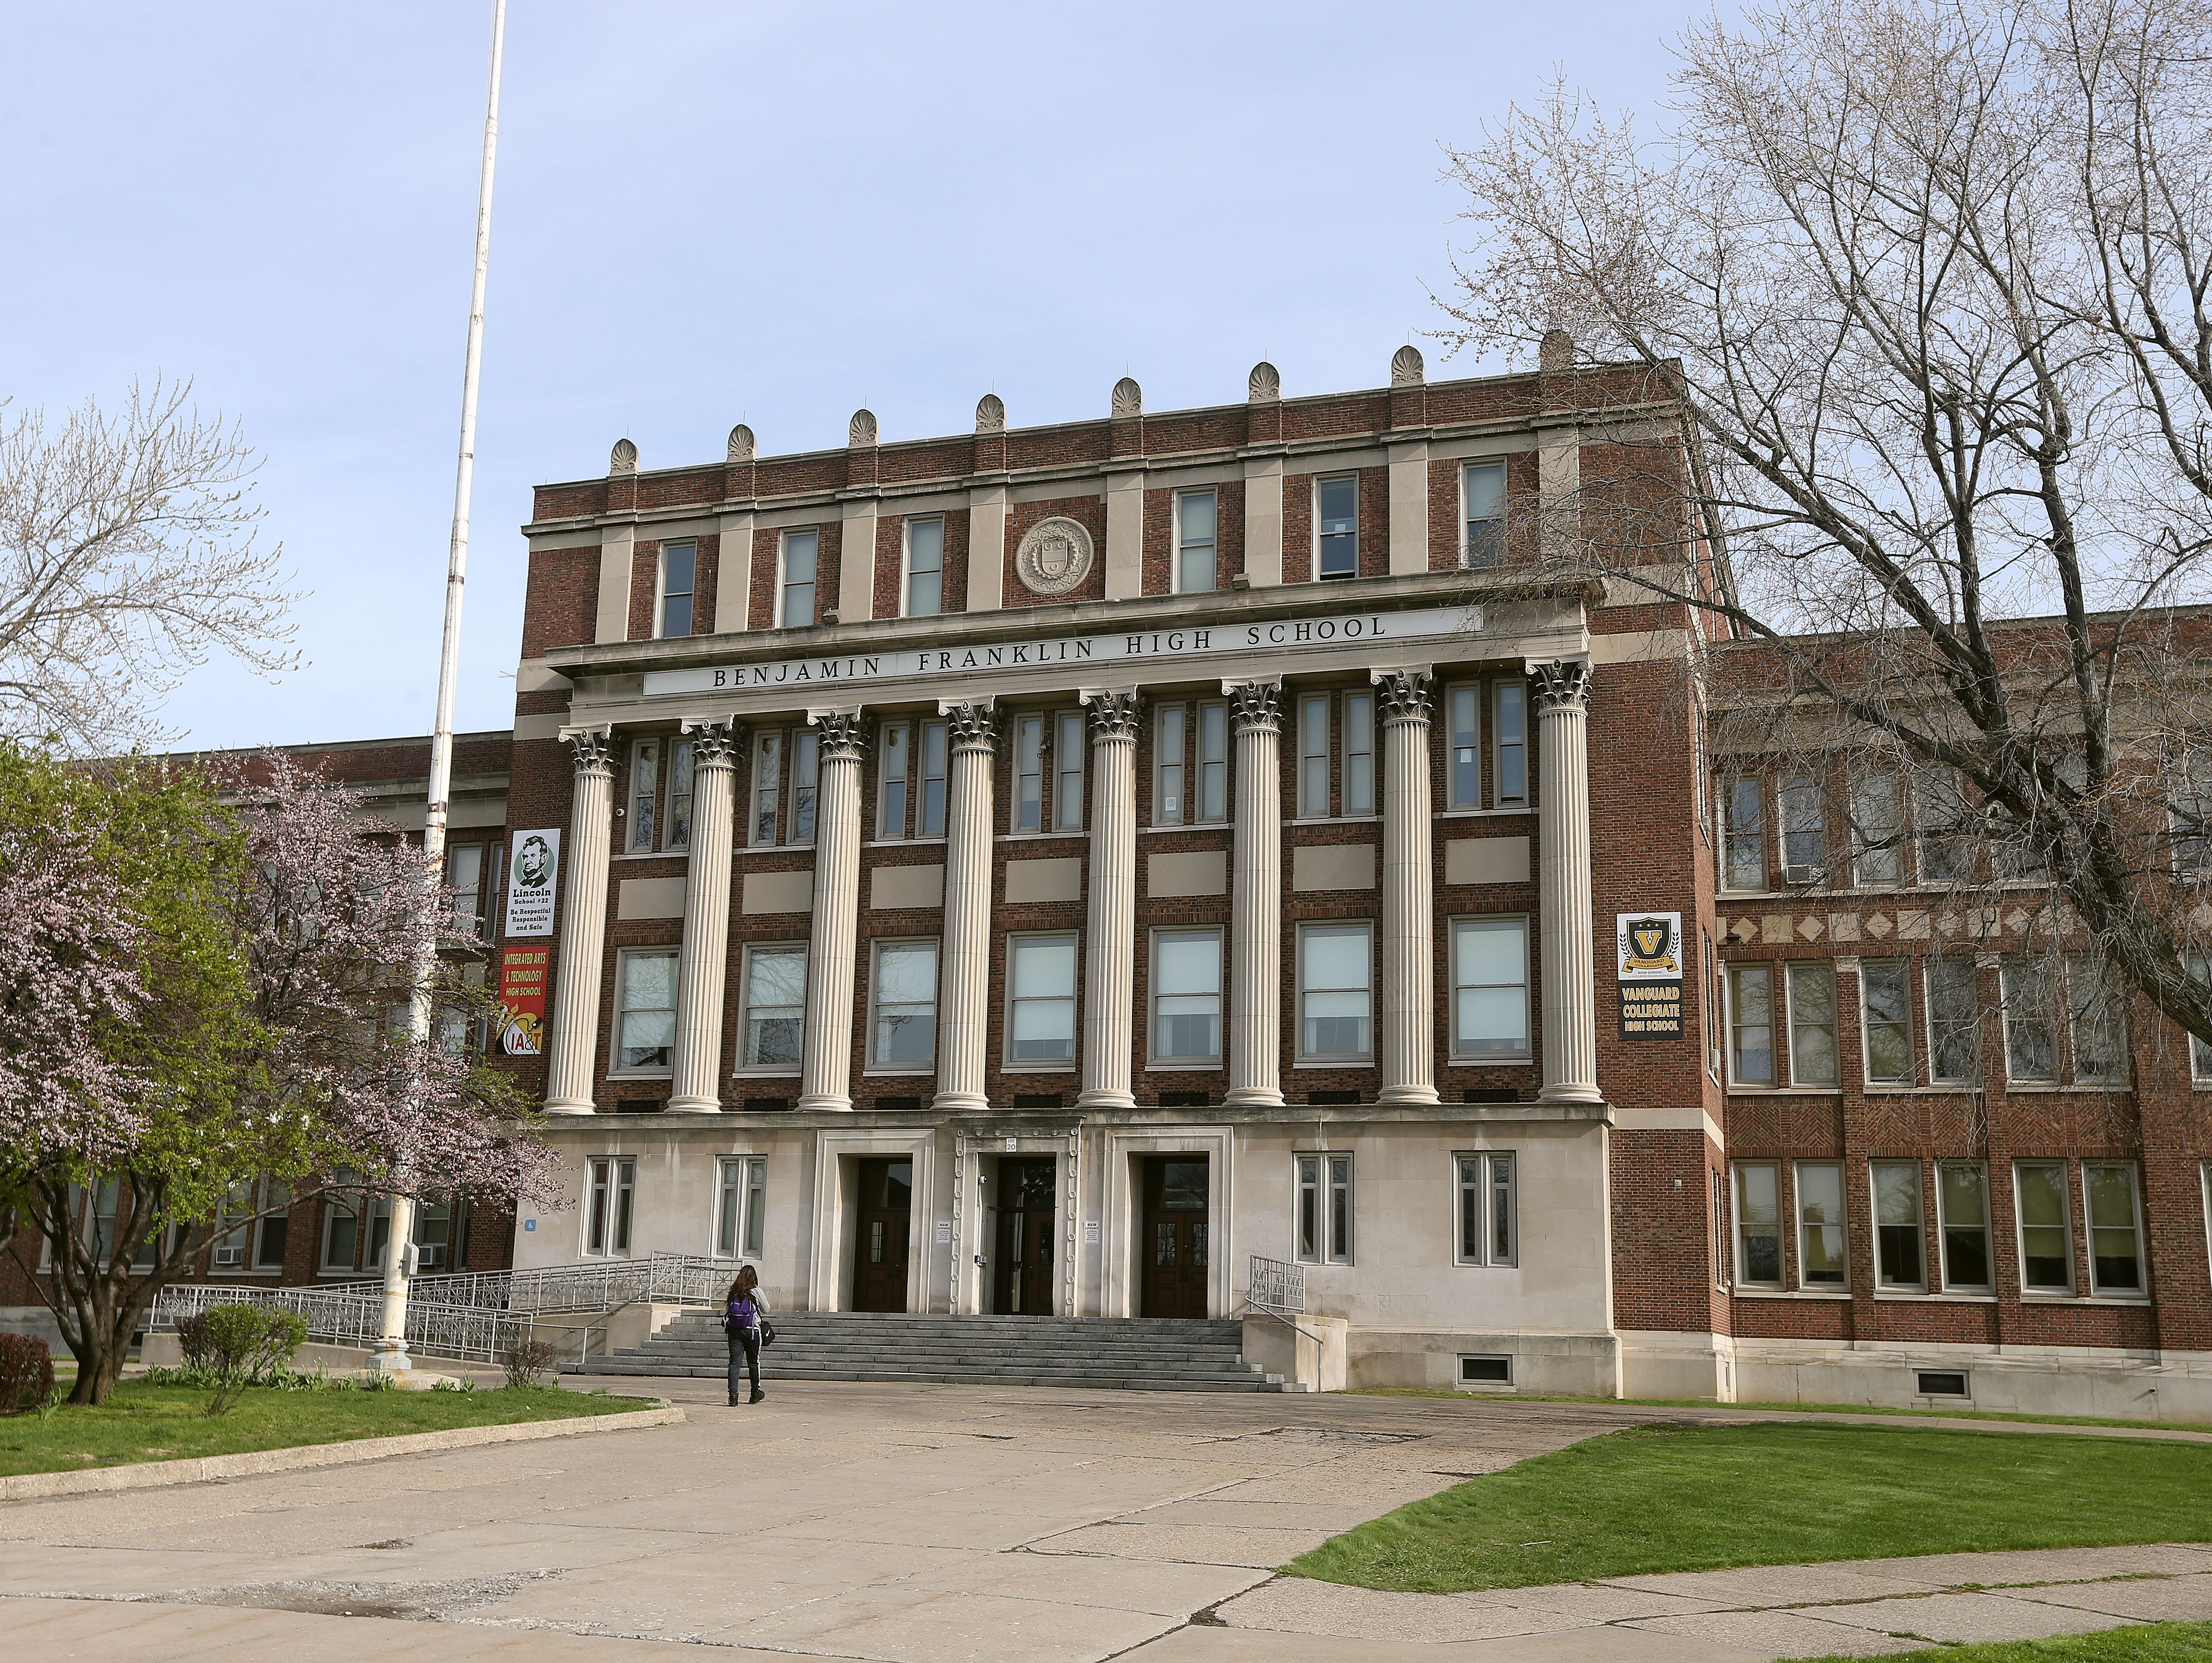 The exterior of Benjamin Franklin High School. .